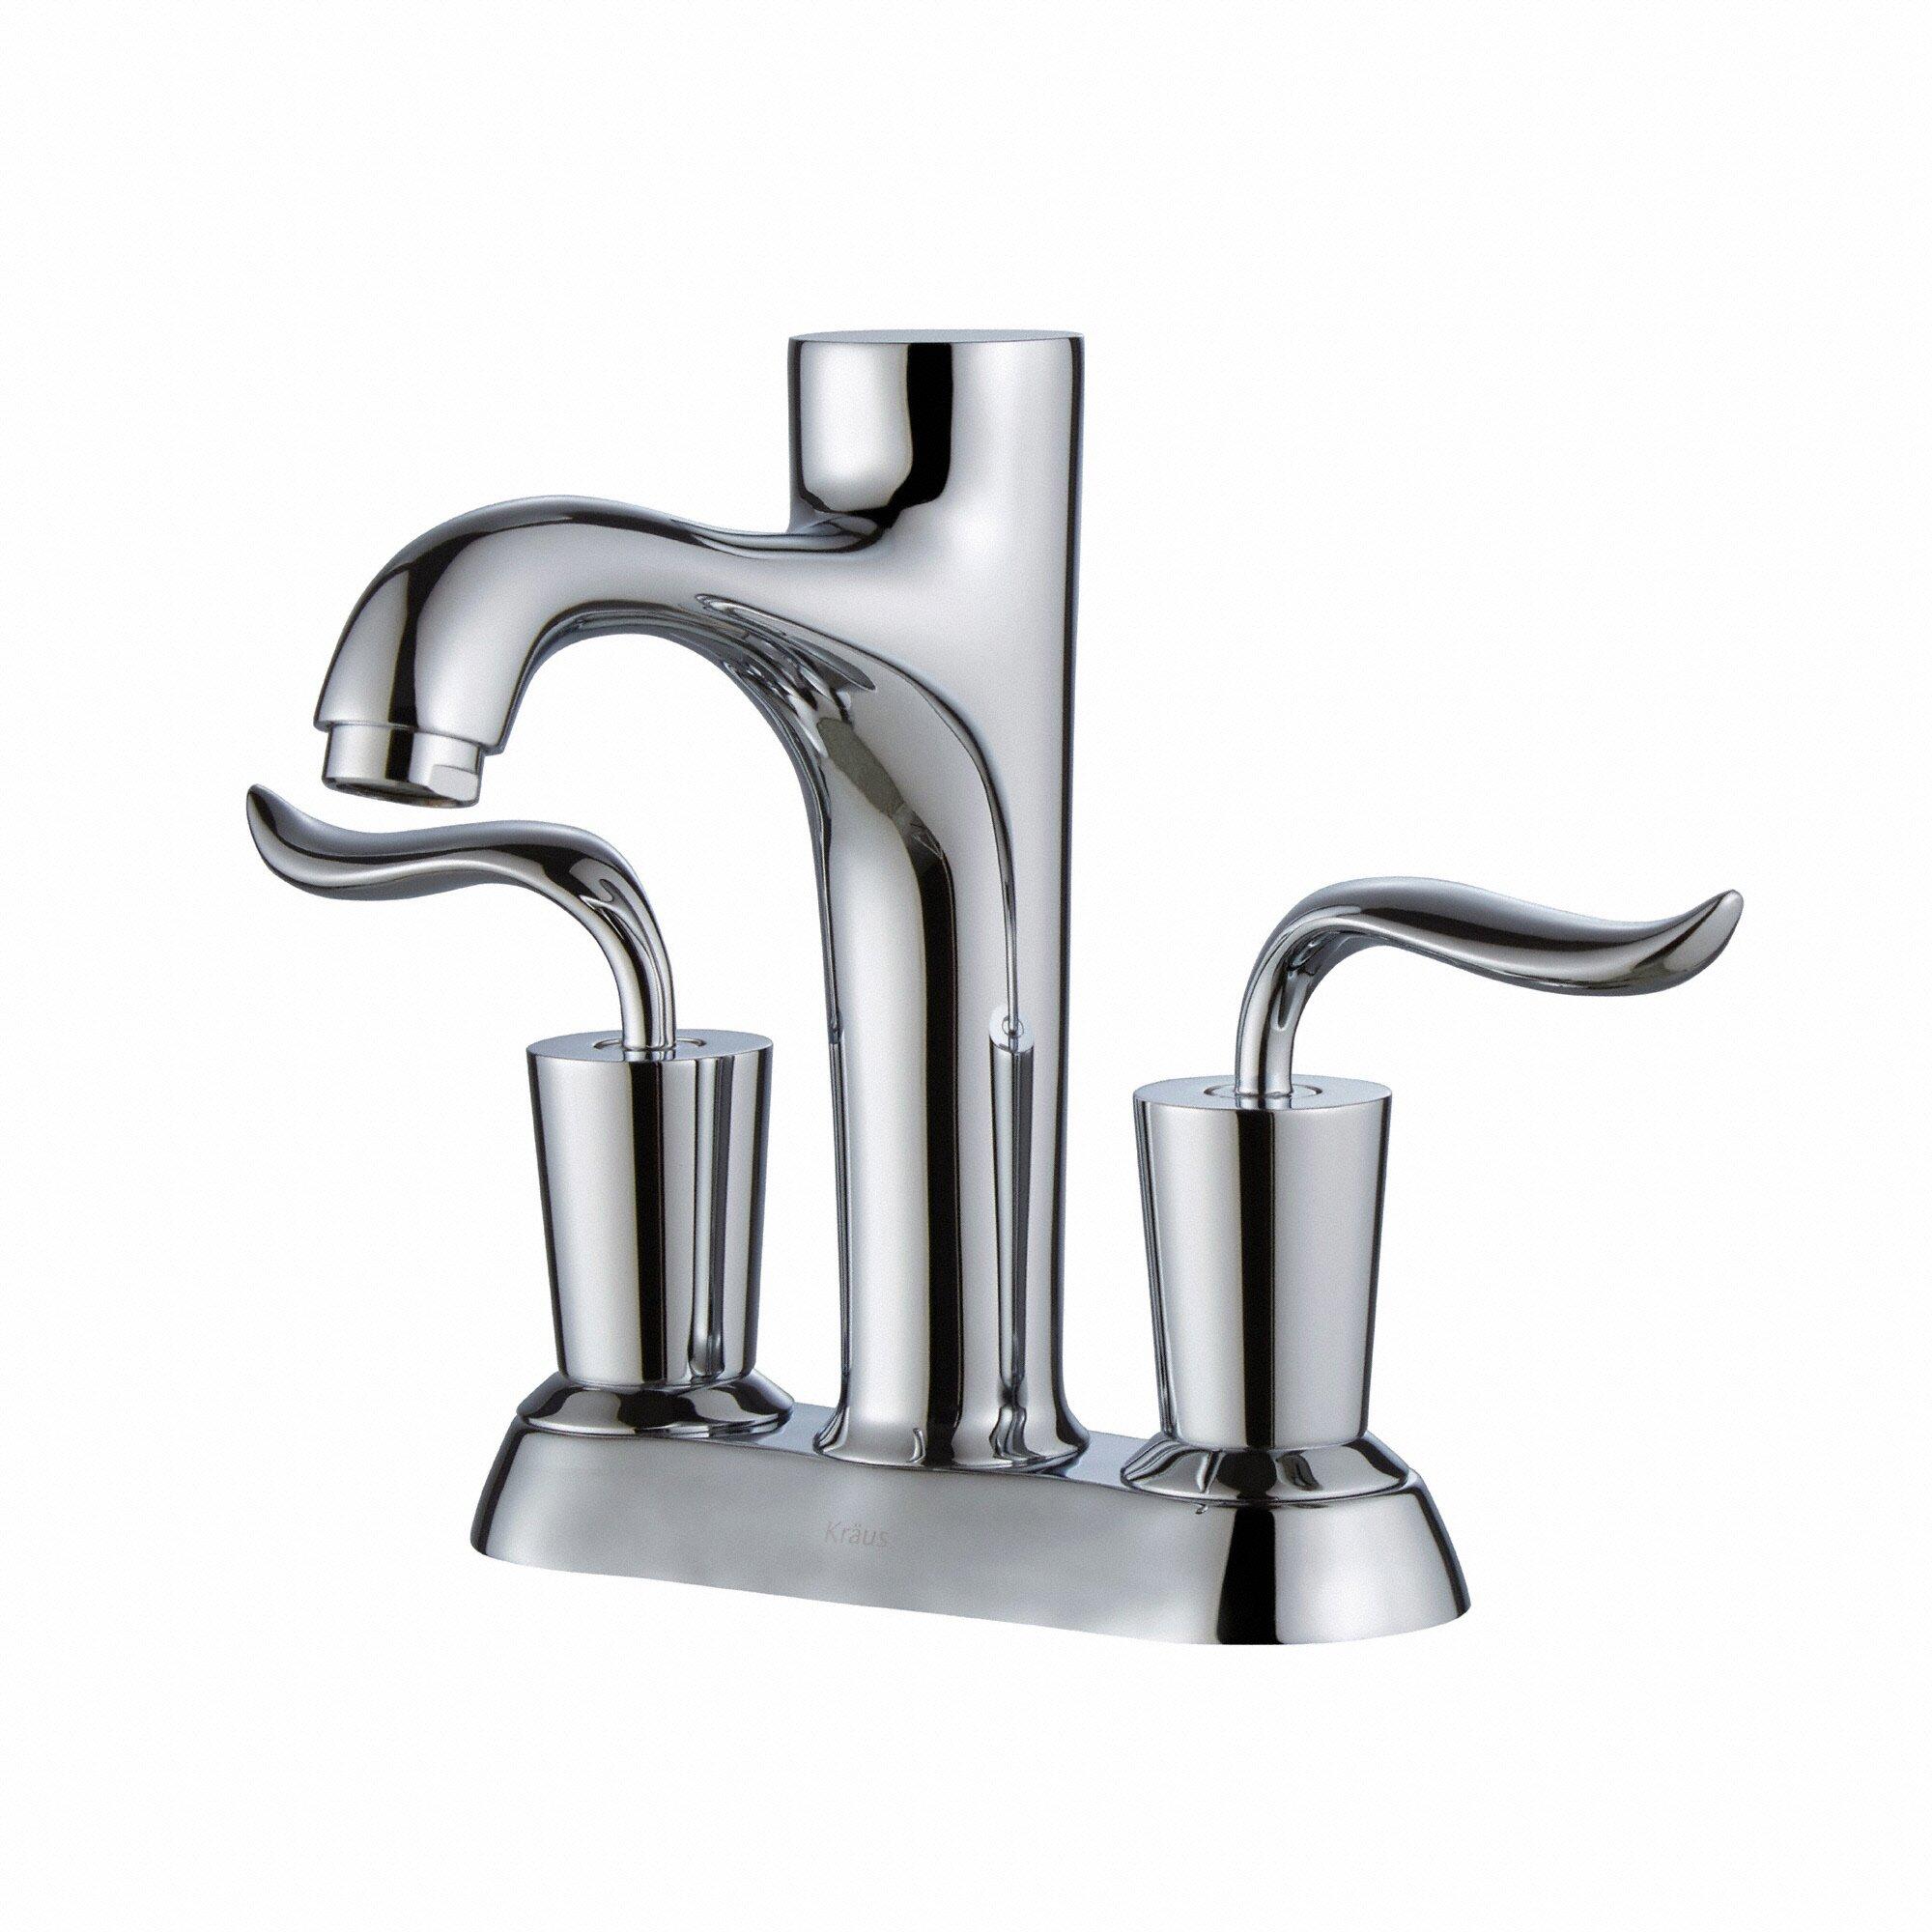 Kraus Coda Double Handle Centerset Bathroom Faucet Reviews Wayfair